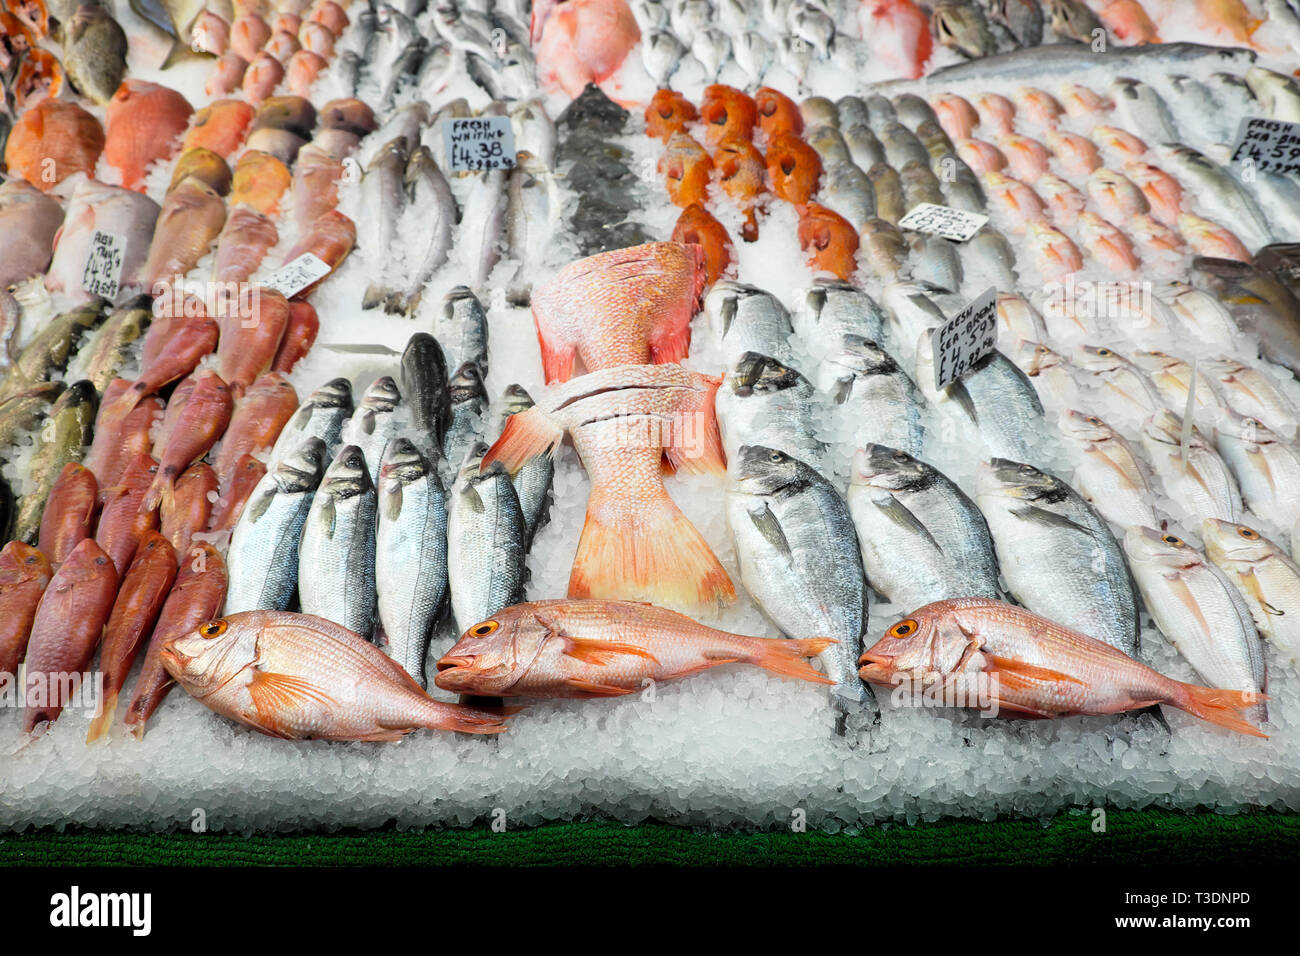 Fish display at fish sellers shop in Brixton Market, South London England UK  KATHY DEWITT Stock Photo